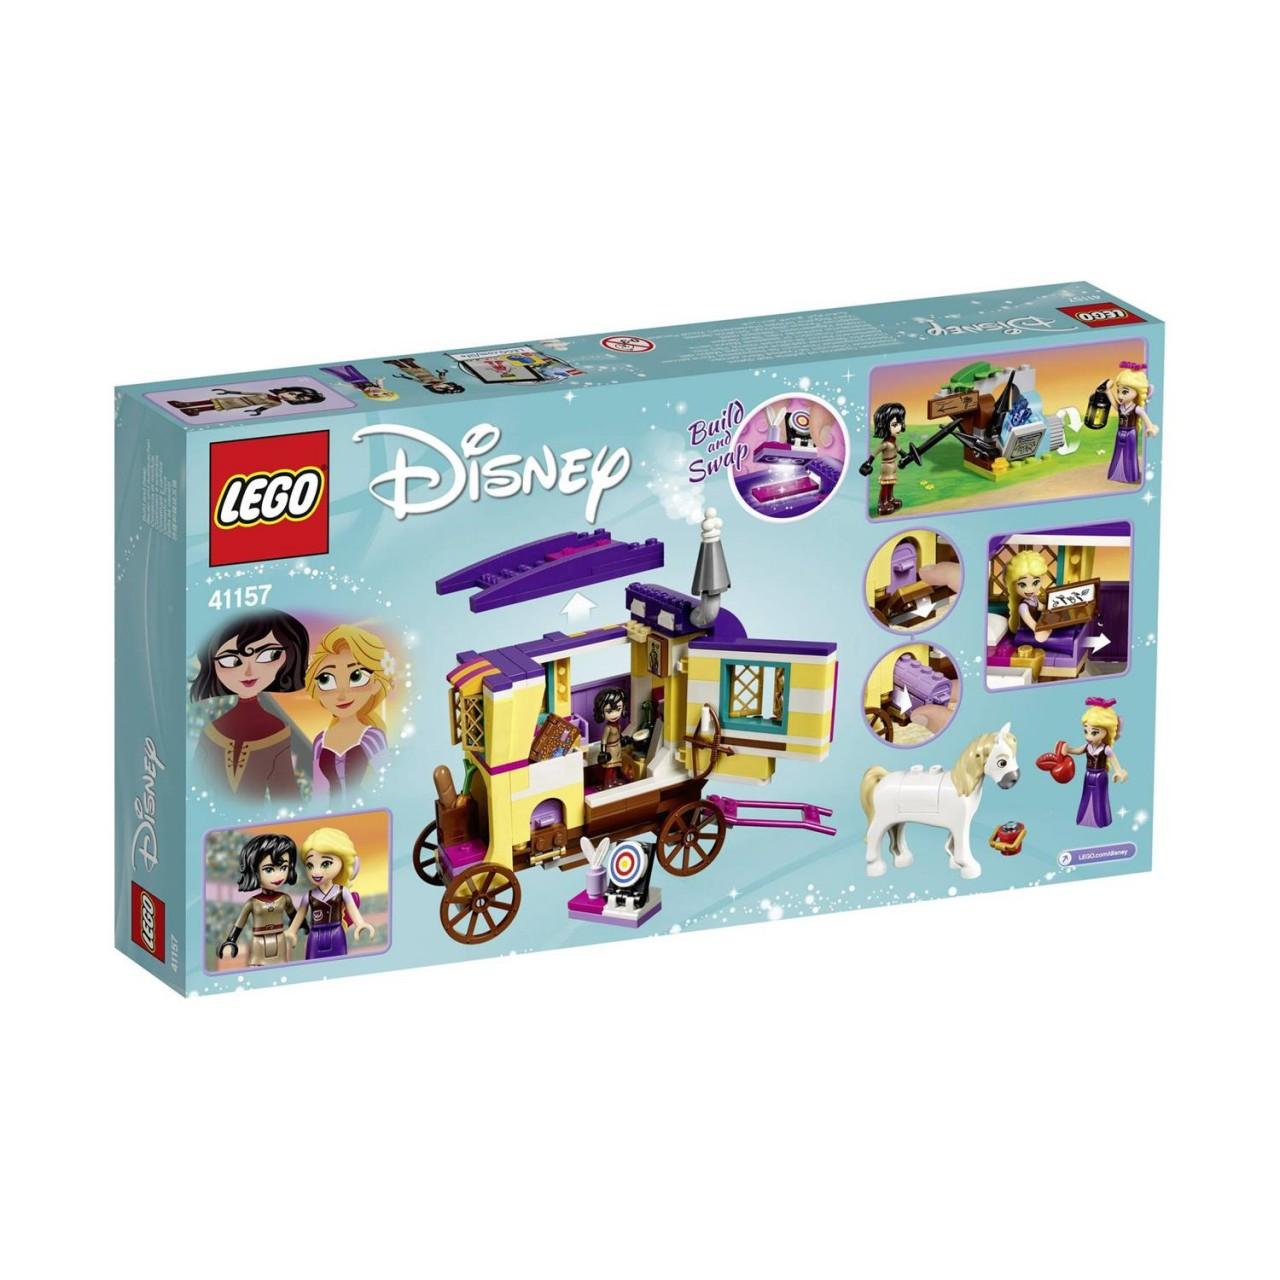 LEGO DISNEY 41157 Rapunzels Reisekutsche